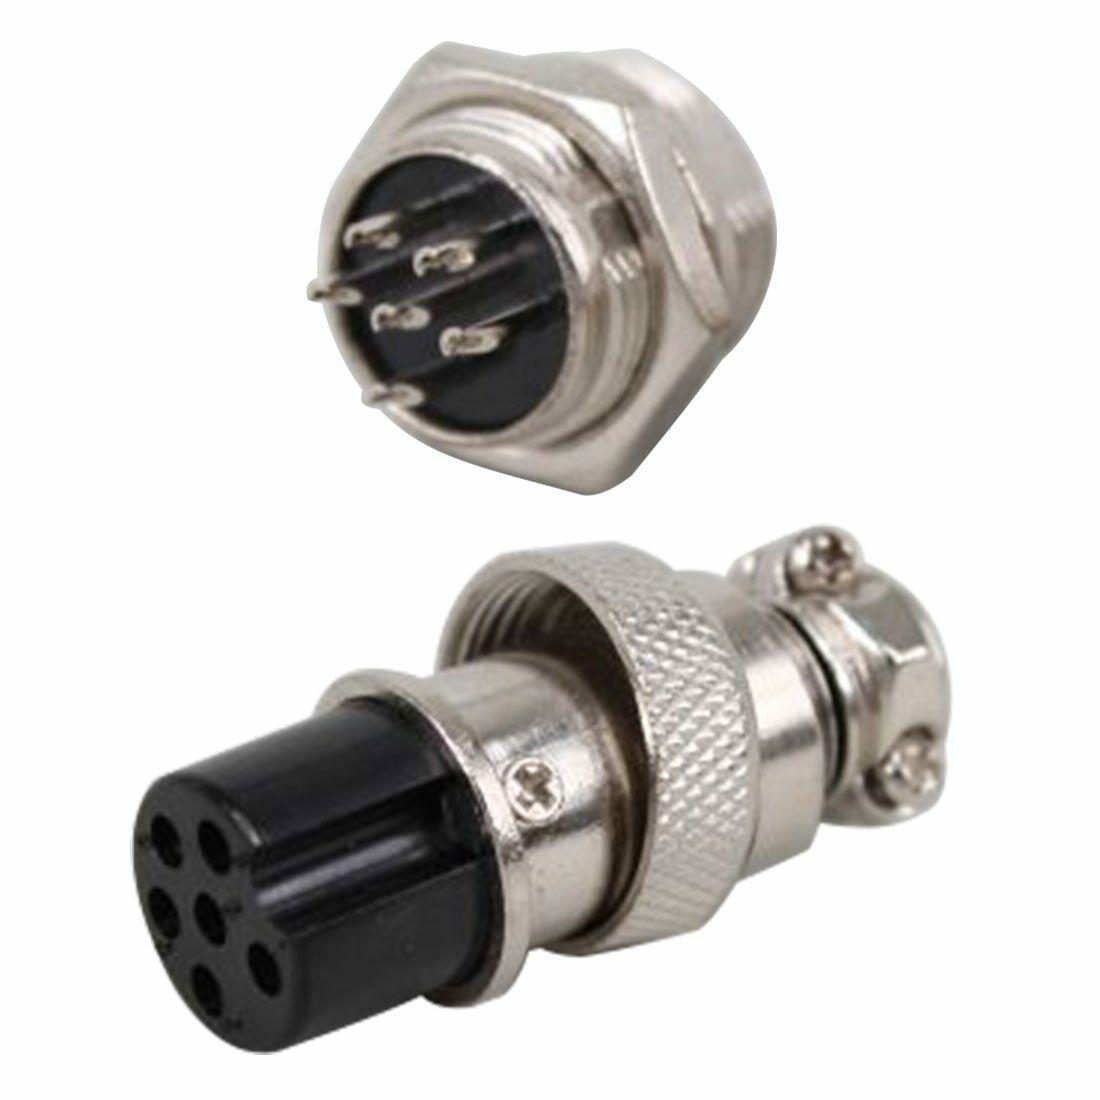 5Pair GX12mm 2-8Pin Female & Male Connector Plug Socket Metal Aviation Plug GX16 6P